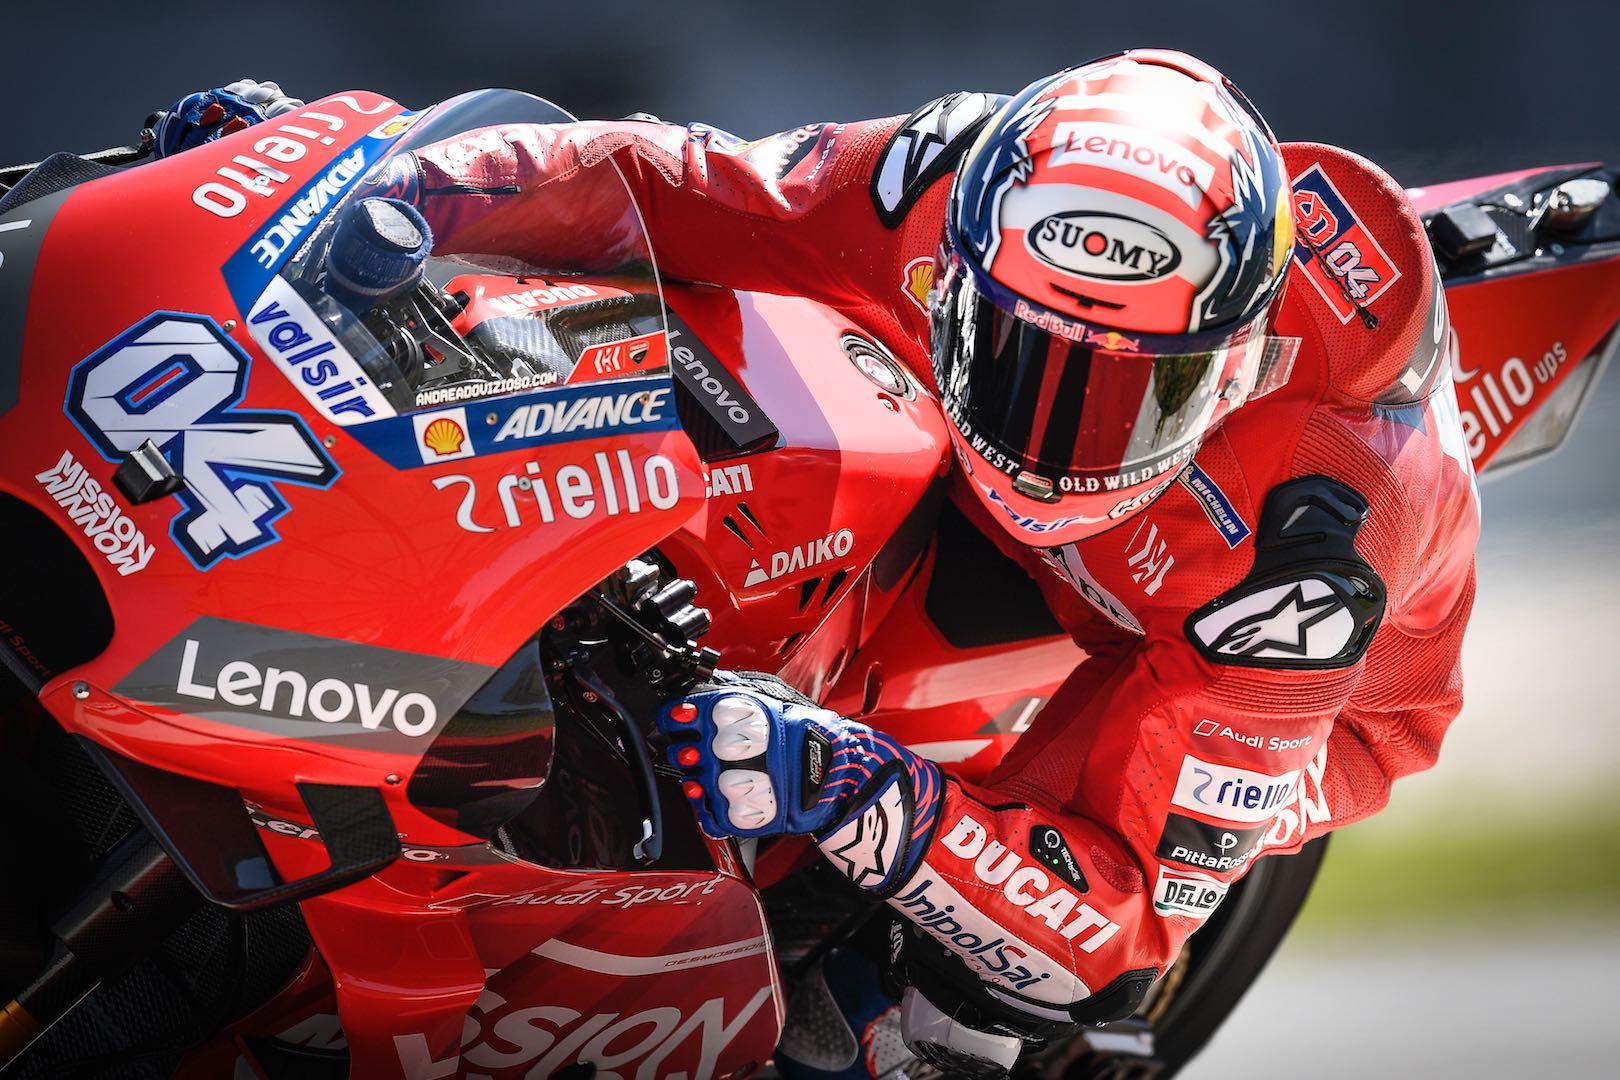 2019 Sepang MotoGP Test, Day 1 Andrea Dovizioso